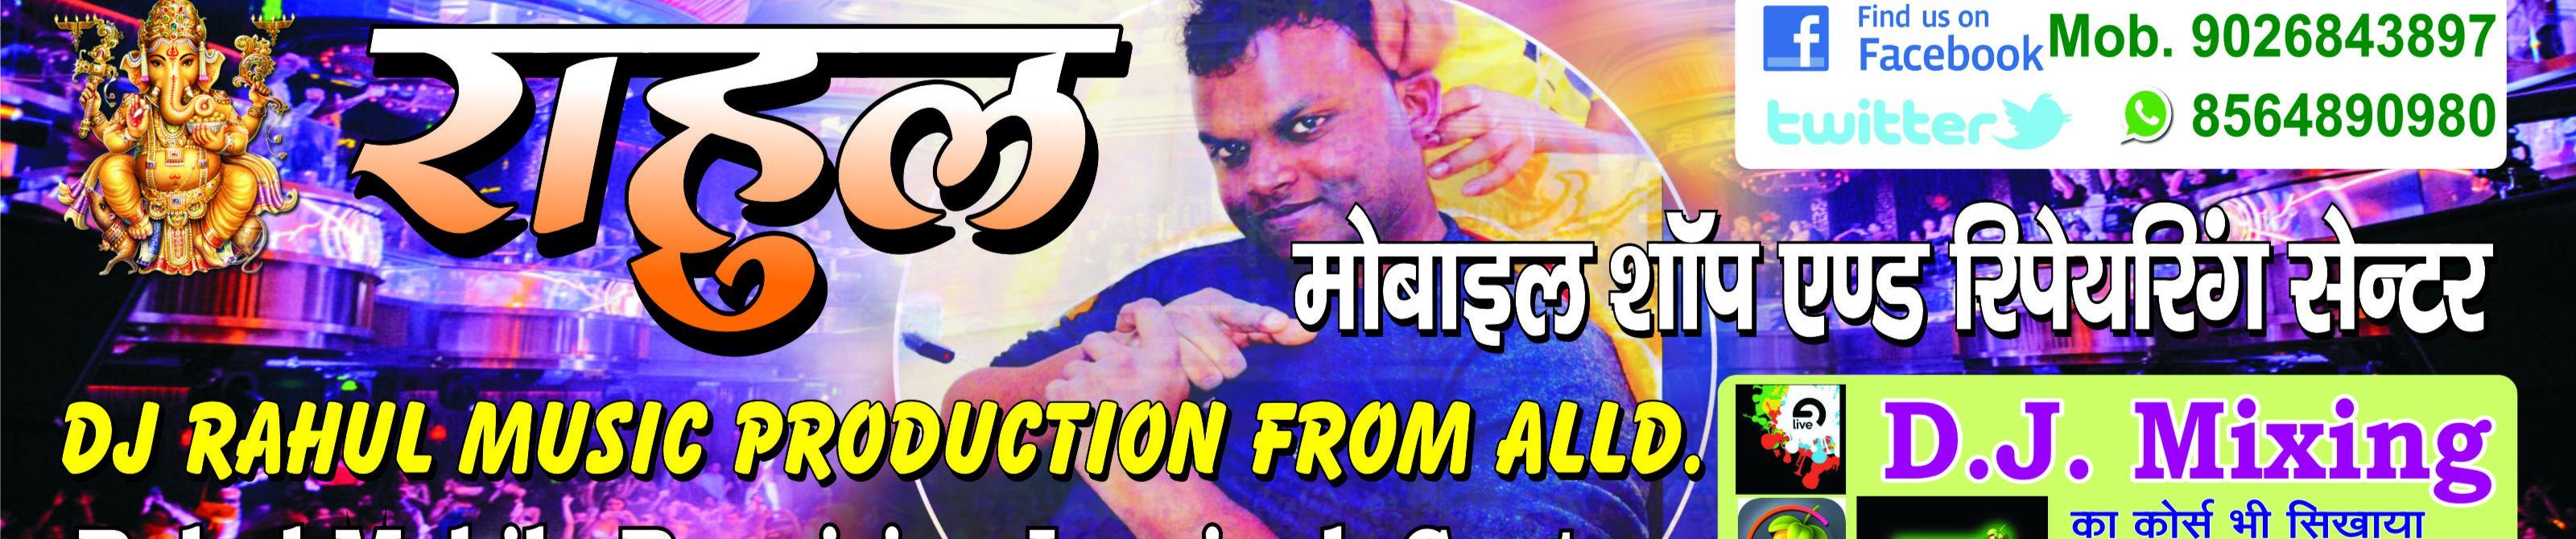 Dj Rahul Music Production   Free Listening on SoundCloud